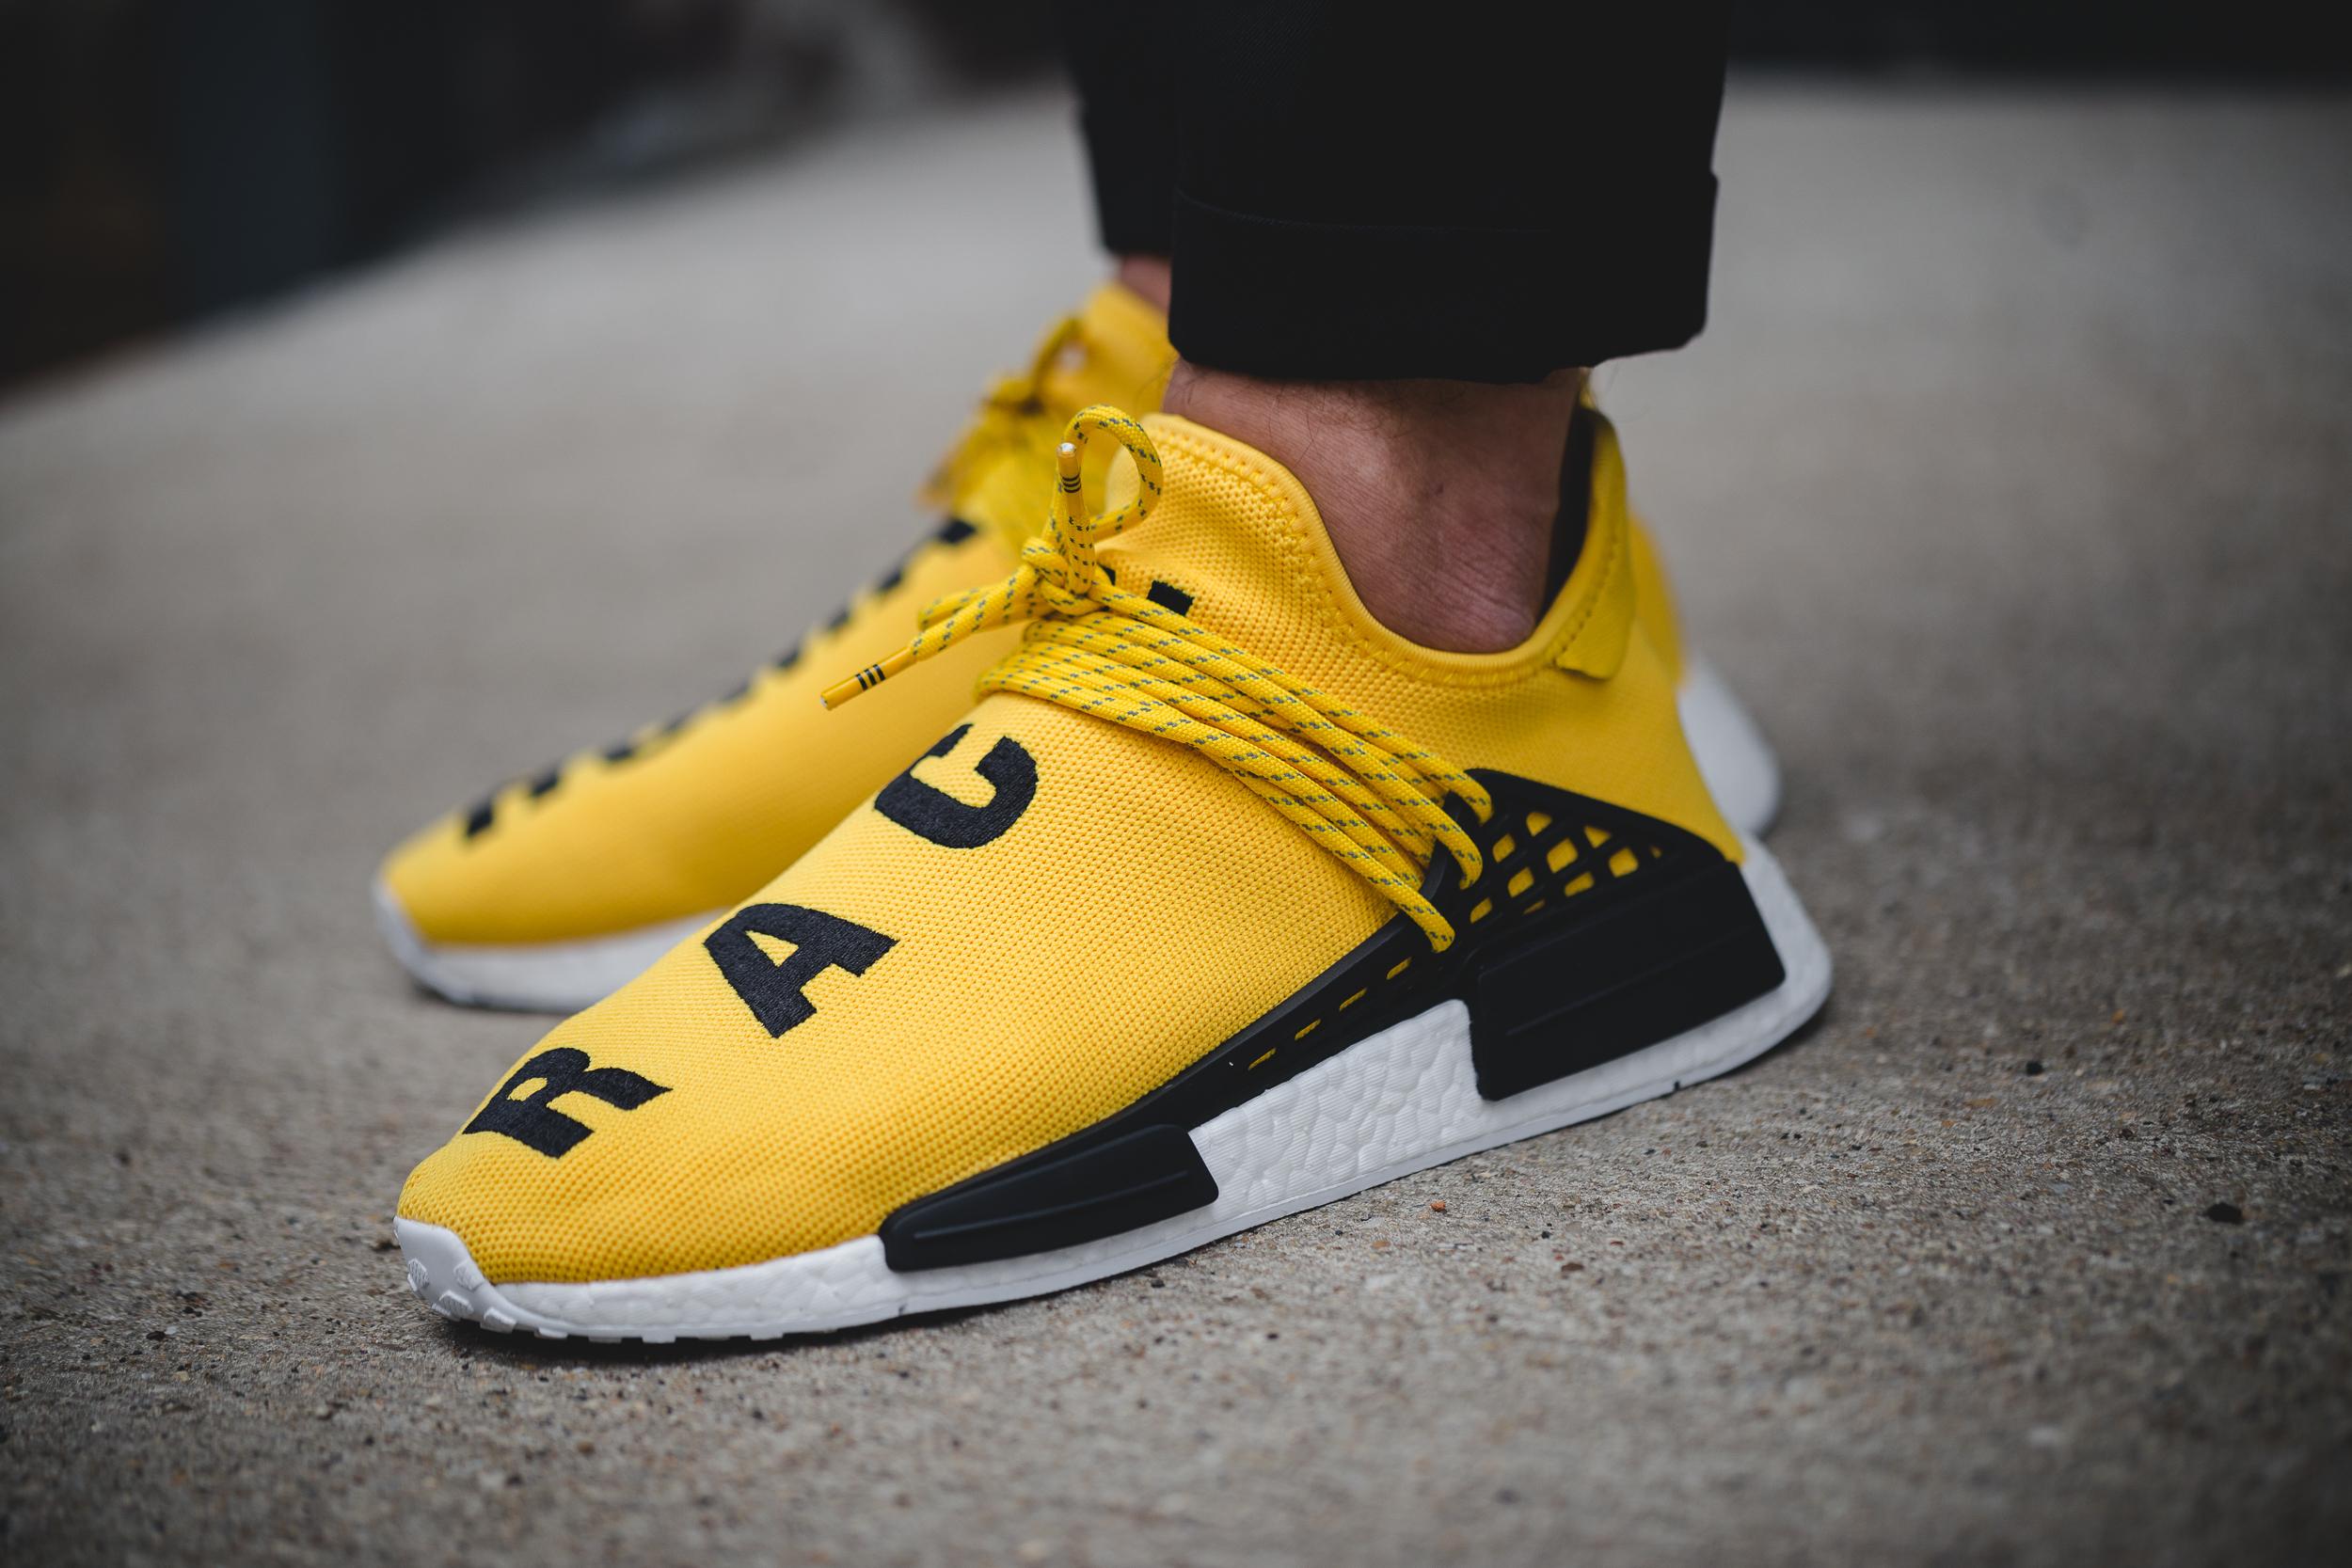 455a5f1a3 EU Kicks adidas Pharrell Williams x adidas NMD  Human Race  Releases  22.07.16